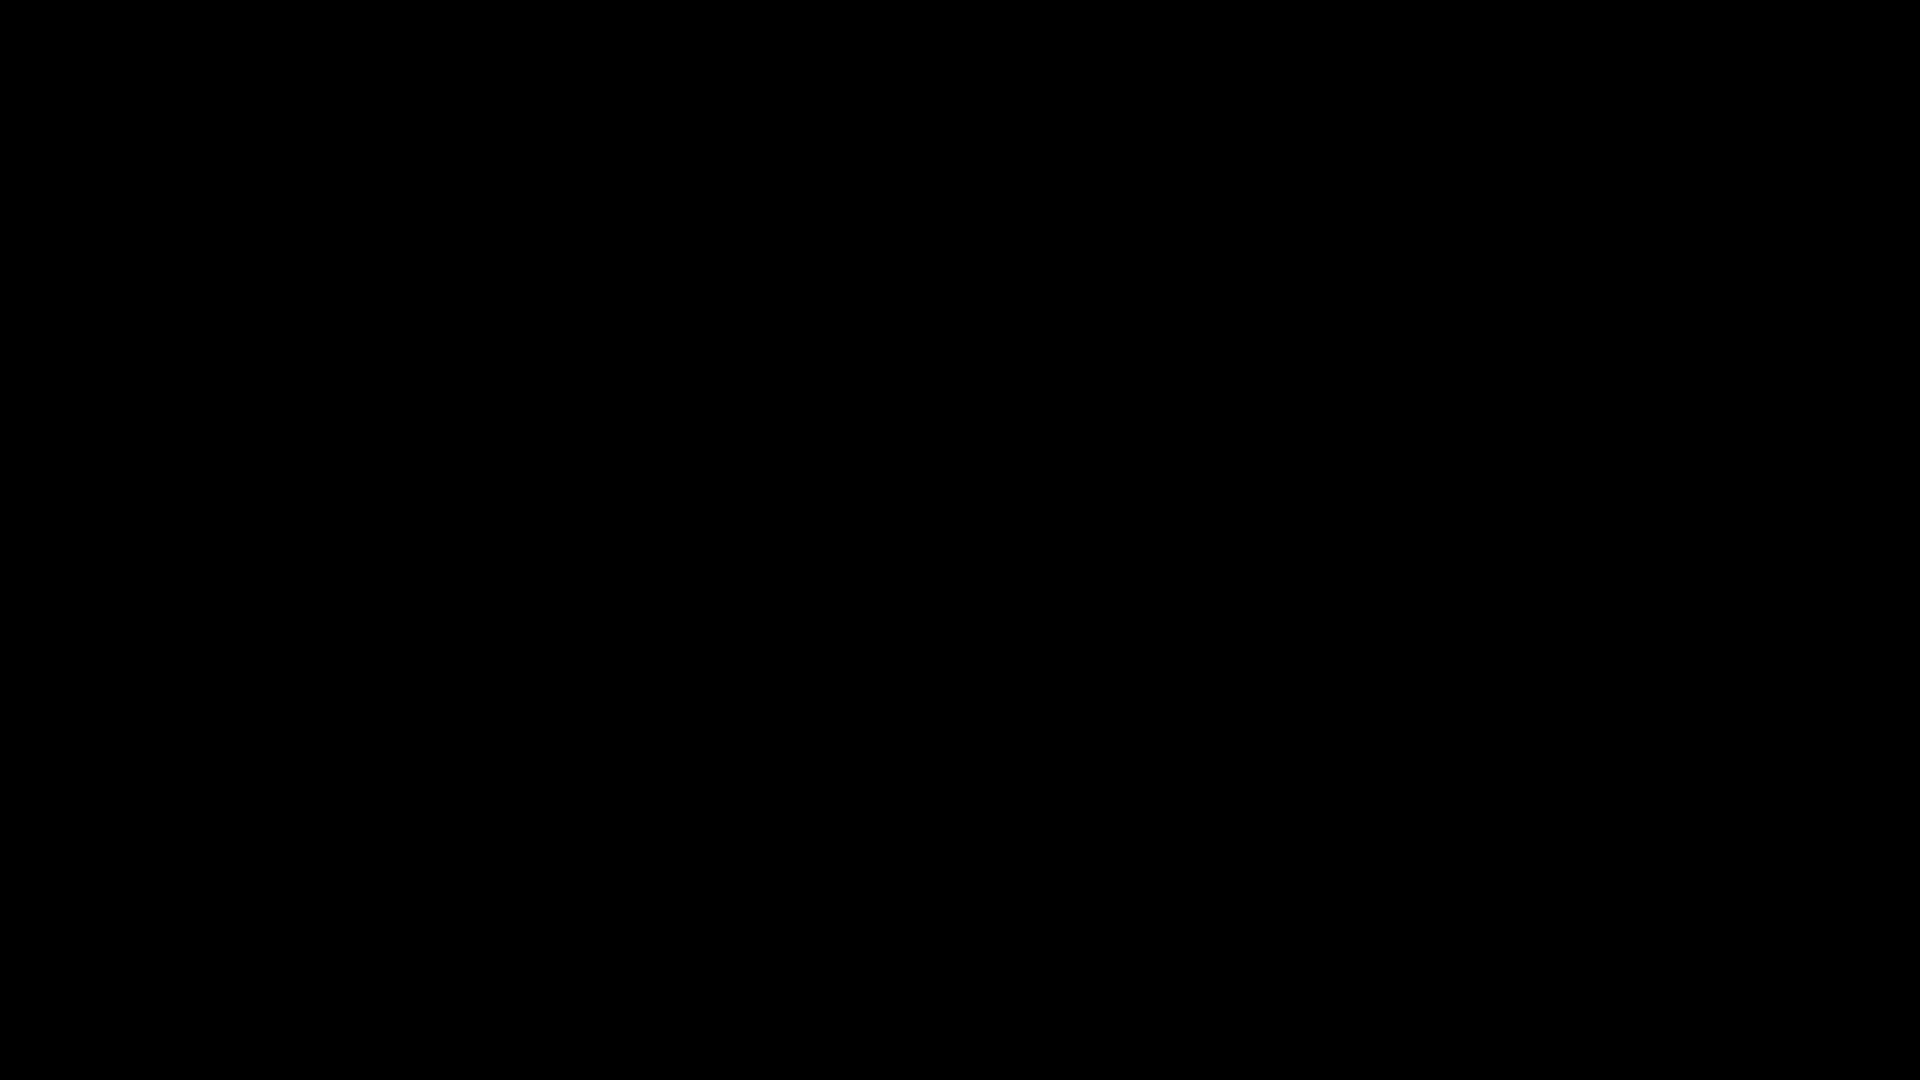 gtaonline, hhgfhfh GIFs